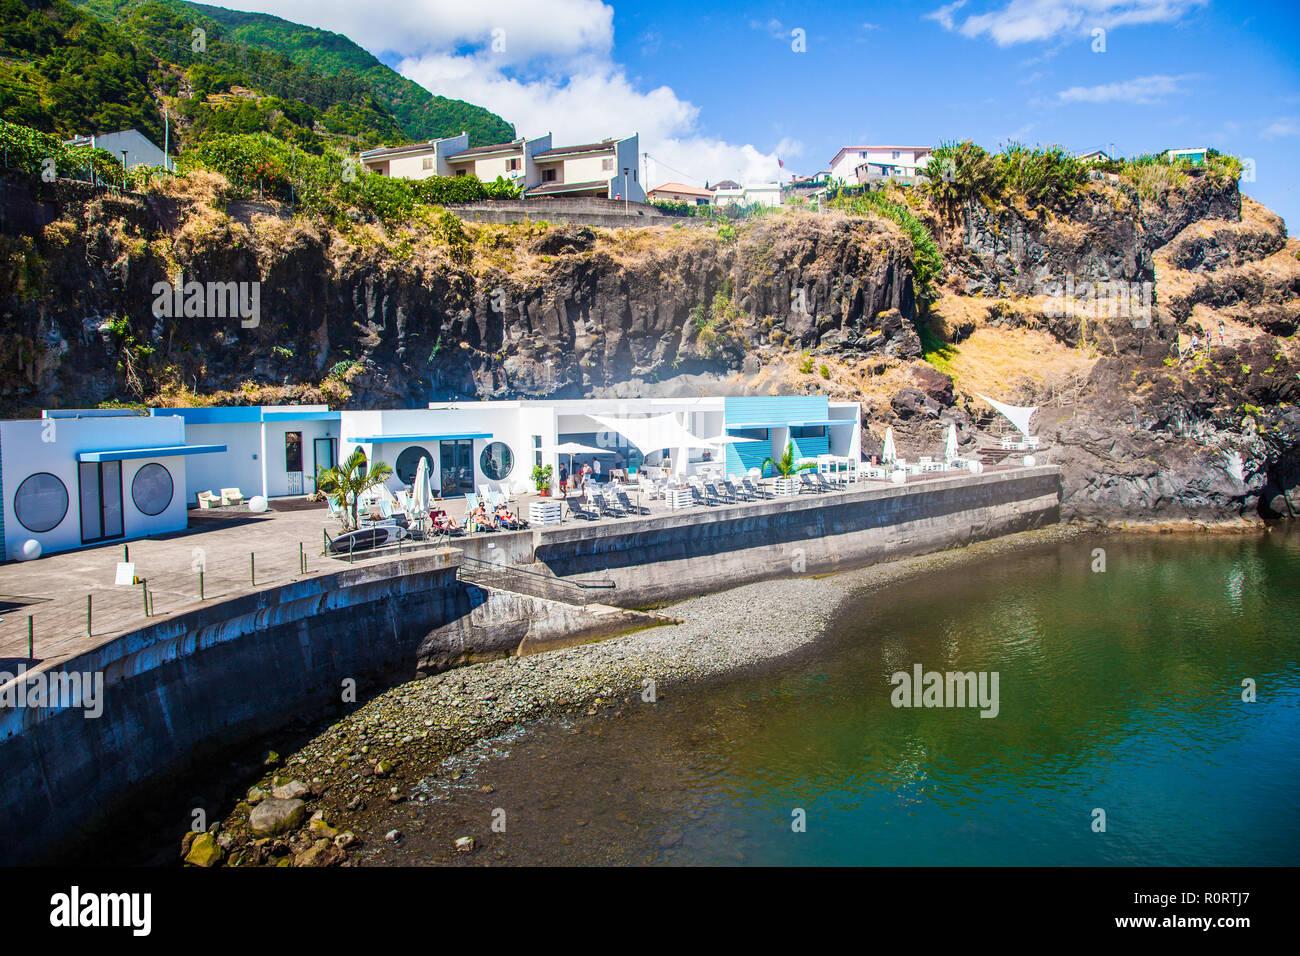 Sexial Lake, Madeira Island, Portugal - Stock Image